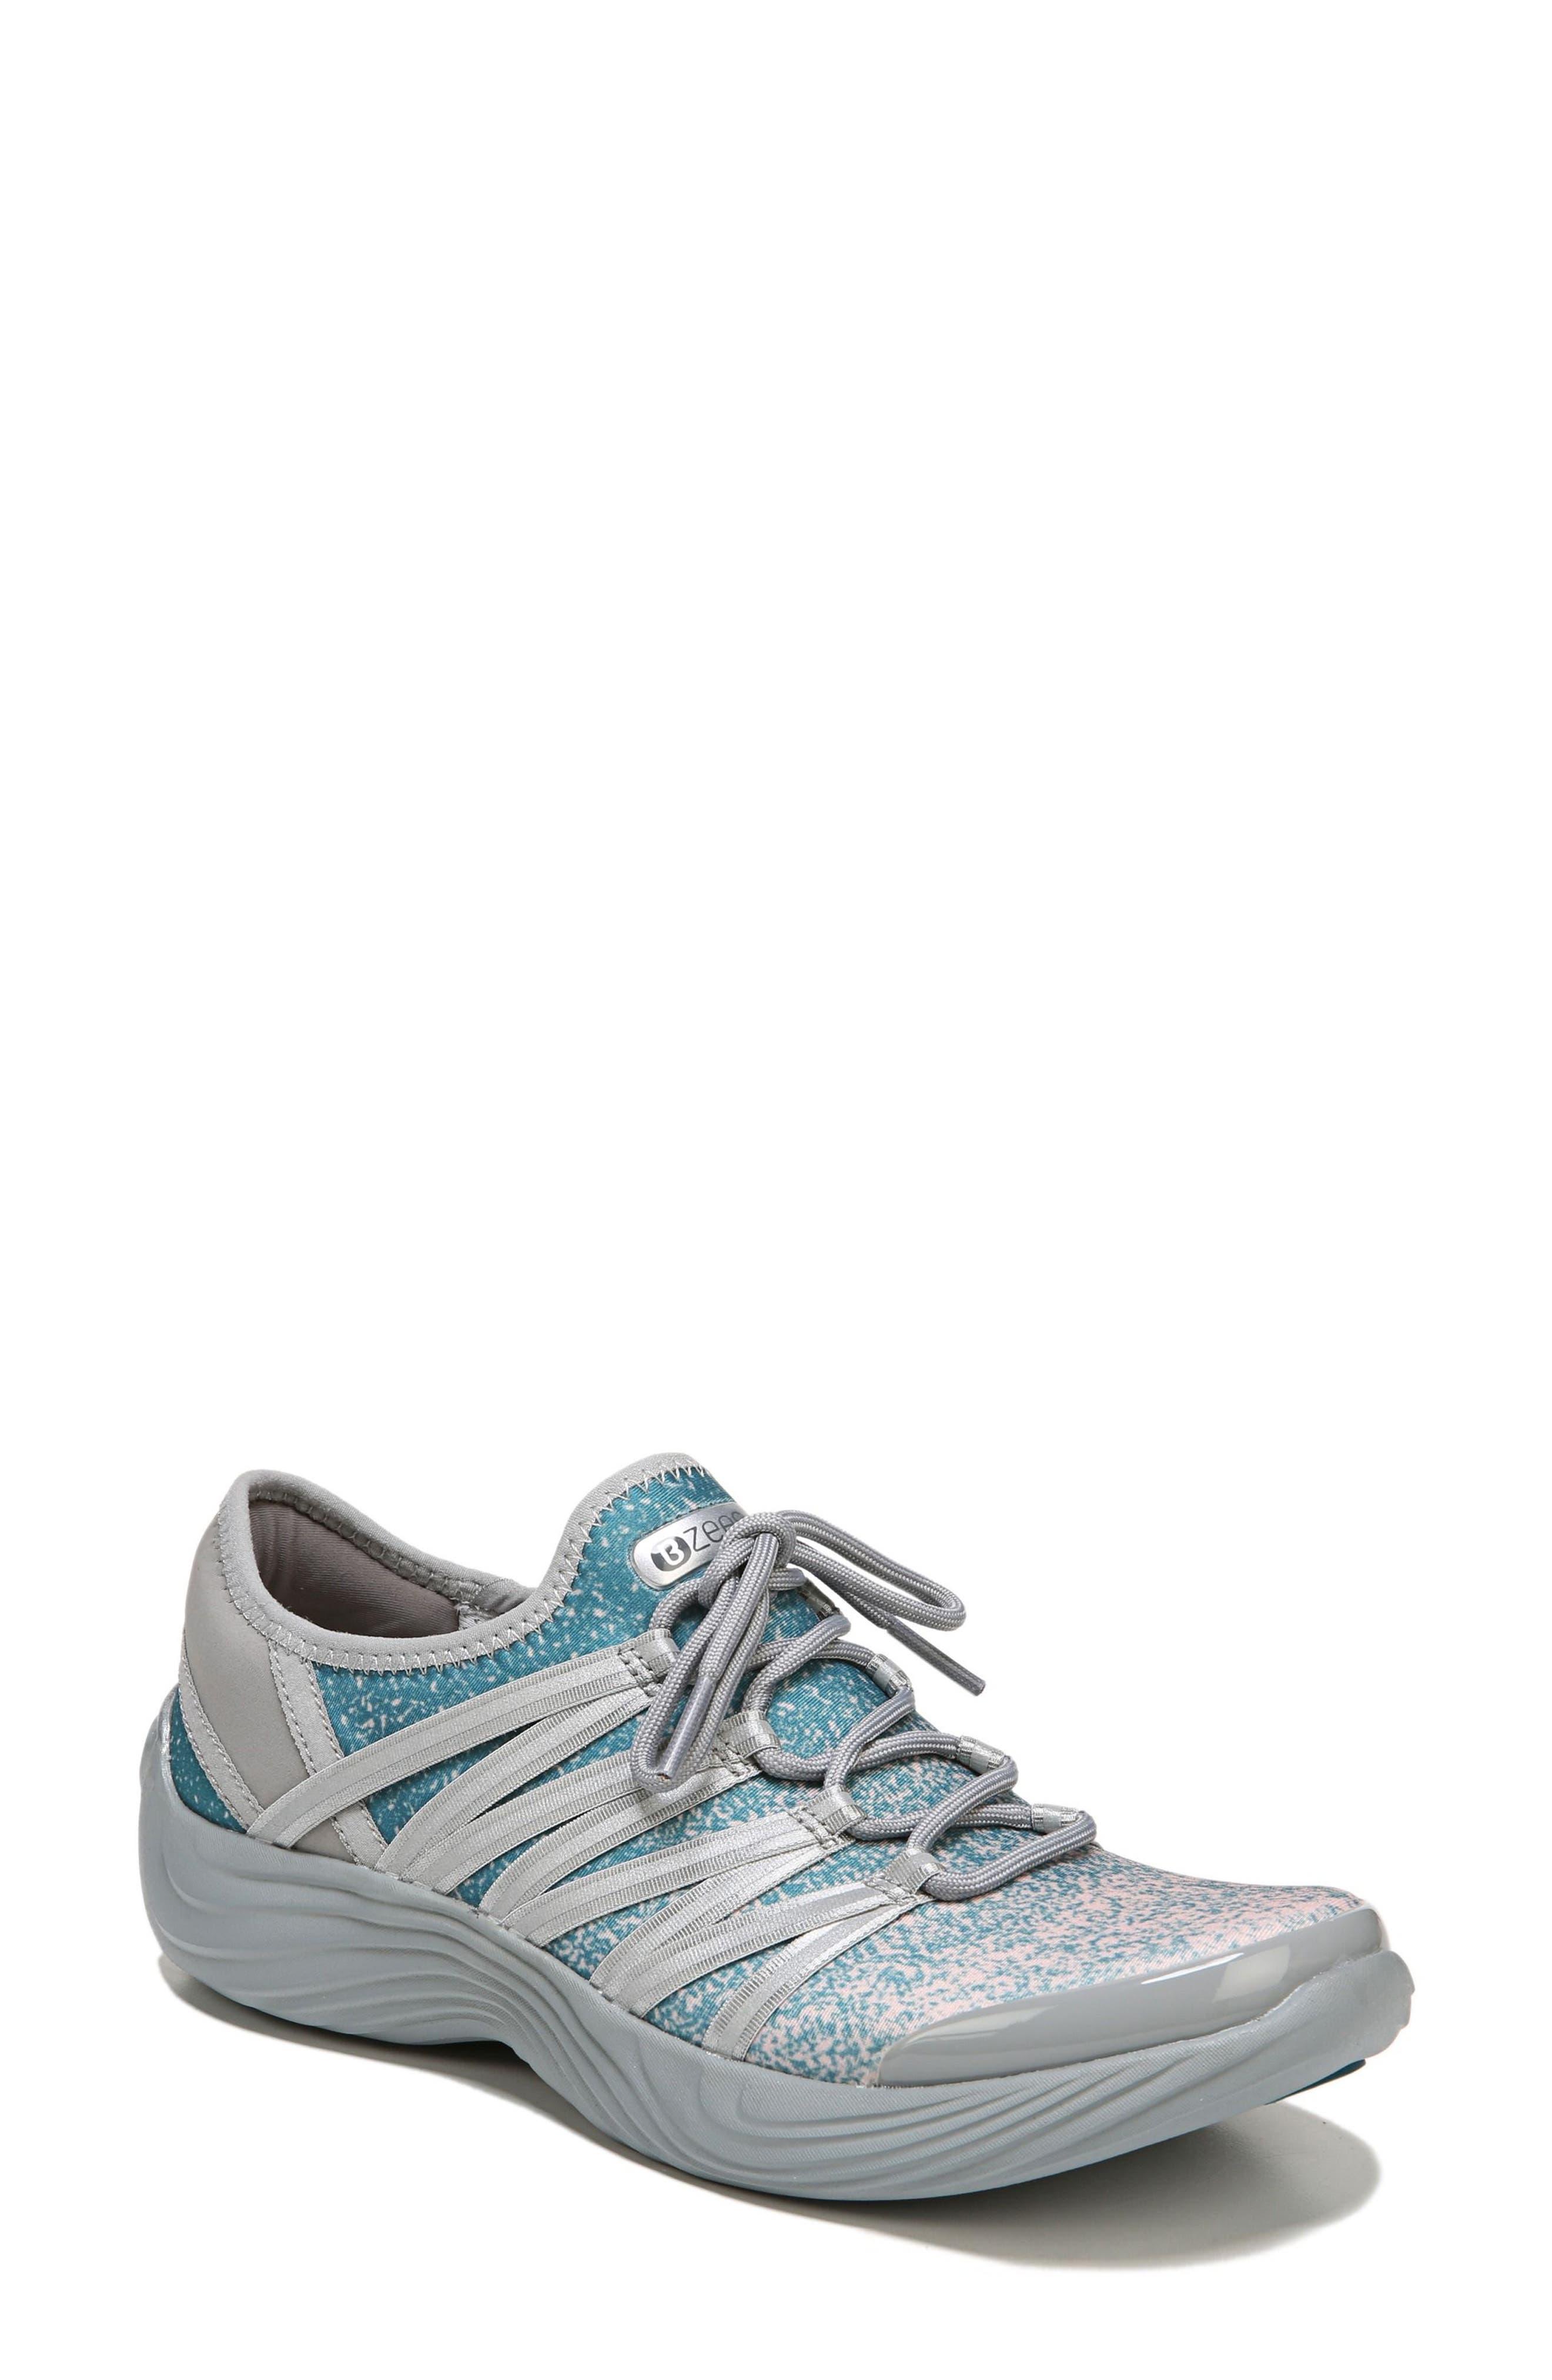 Tender Sneaker,                             Main thumbnail 1, color,                             Pink Fabric